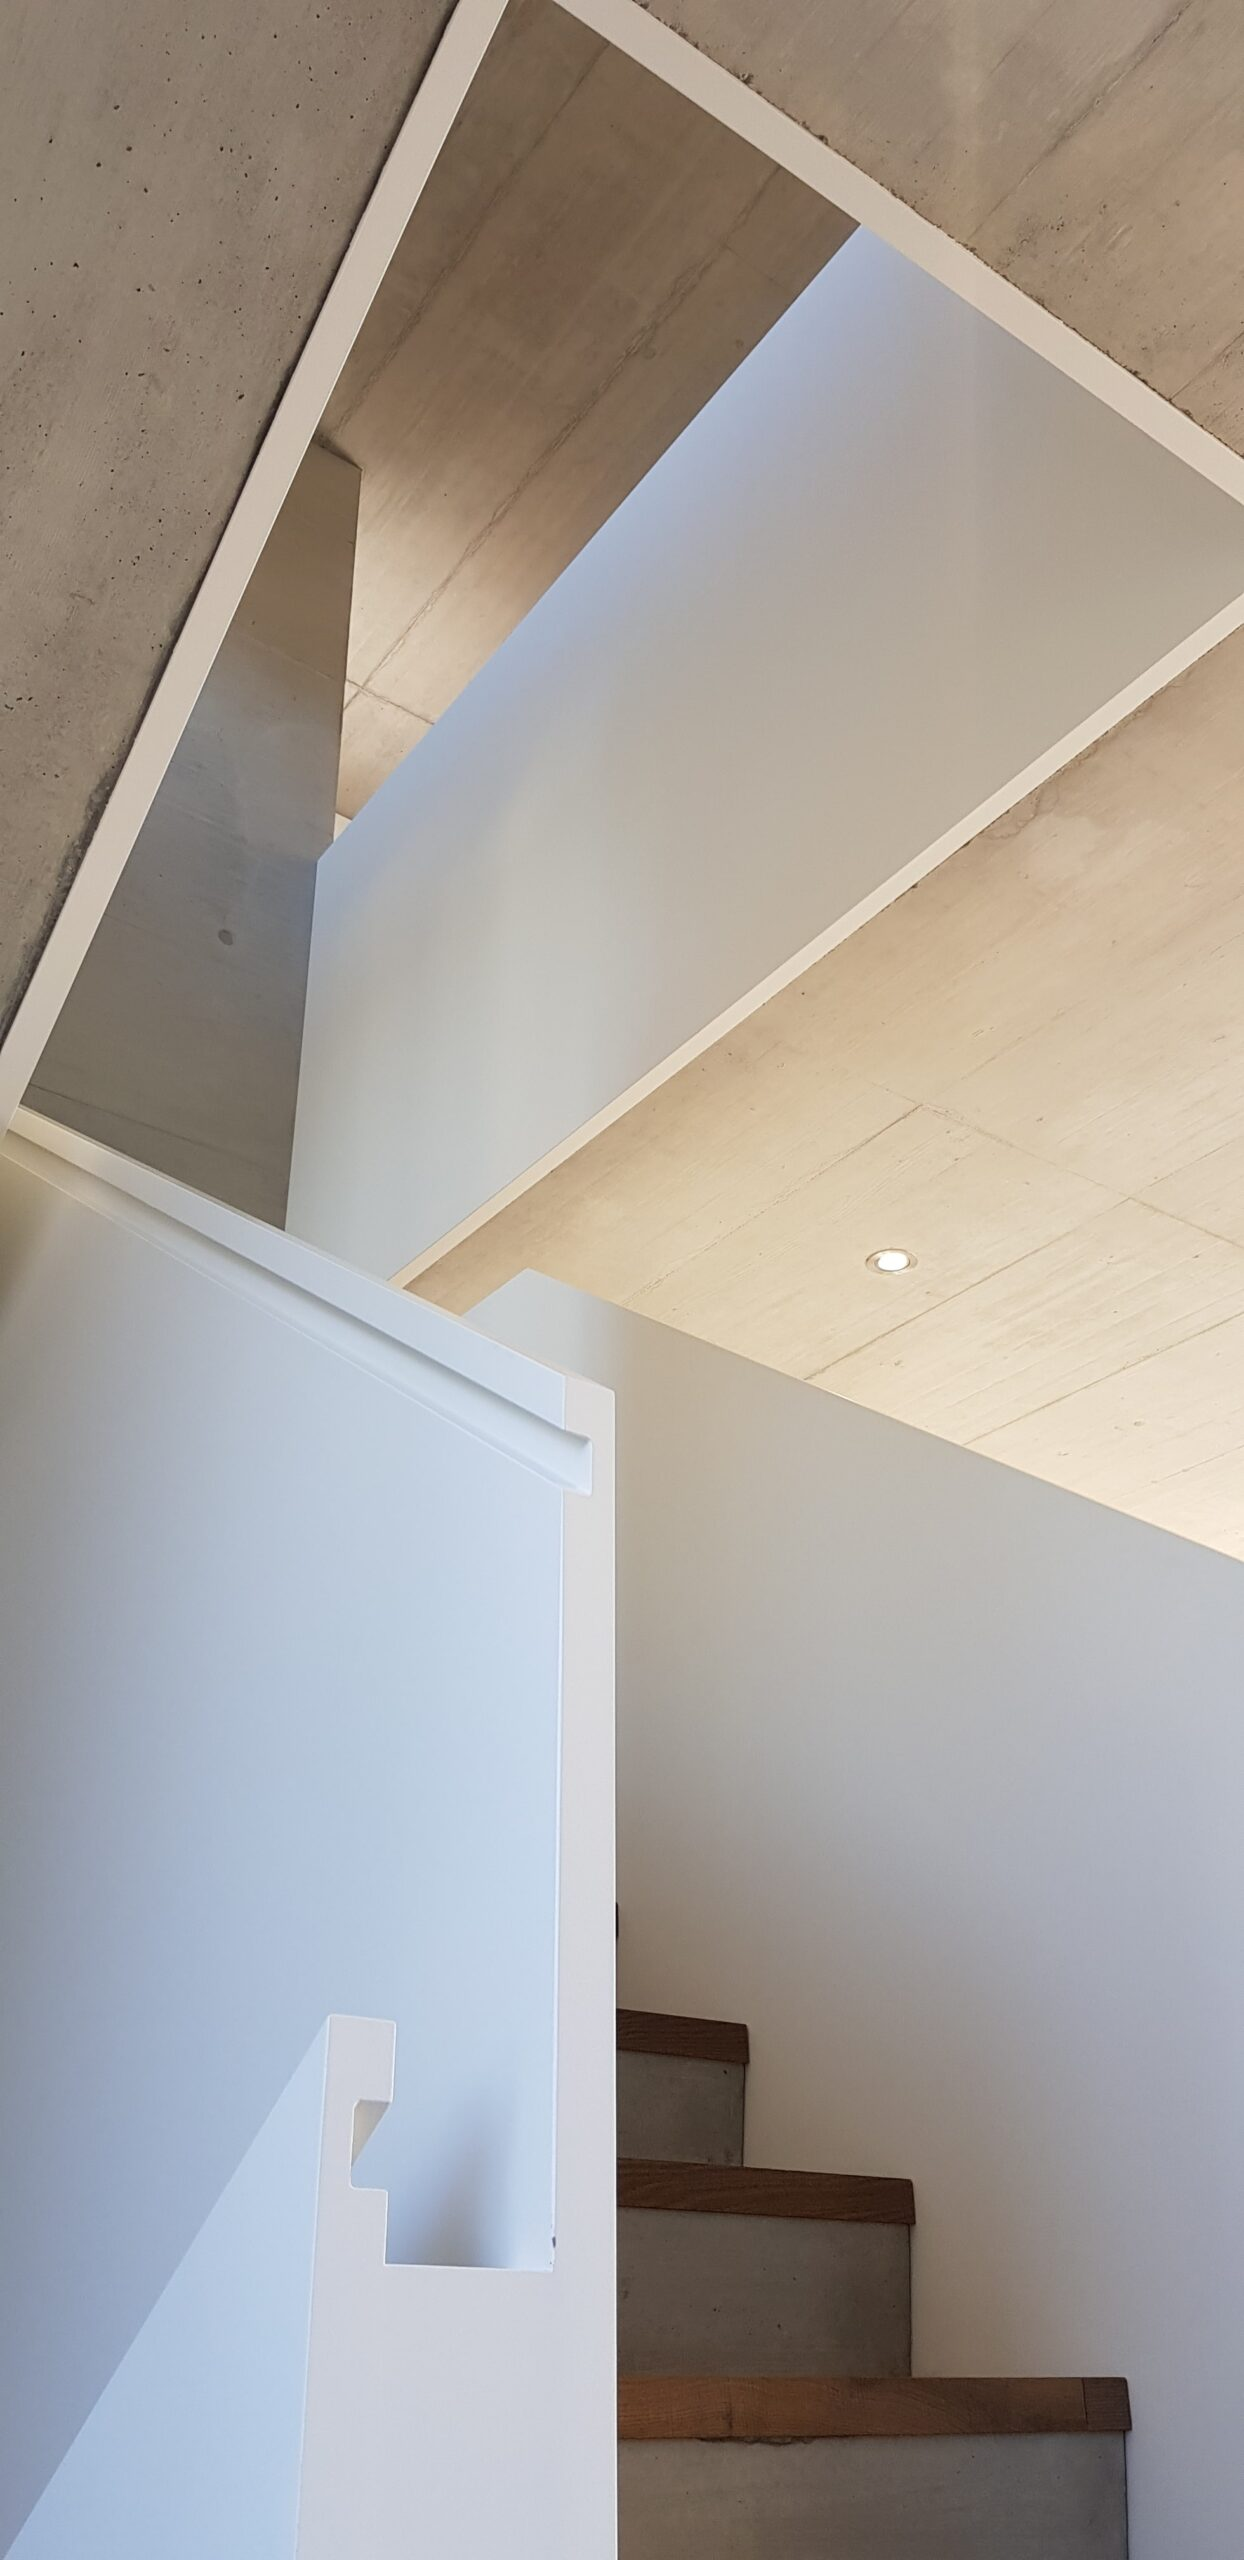 Wooddesign_Treppen_Teppengeländer weiss_Holztreppen_Treppenverkleidung_modern Eiche (14)-min